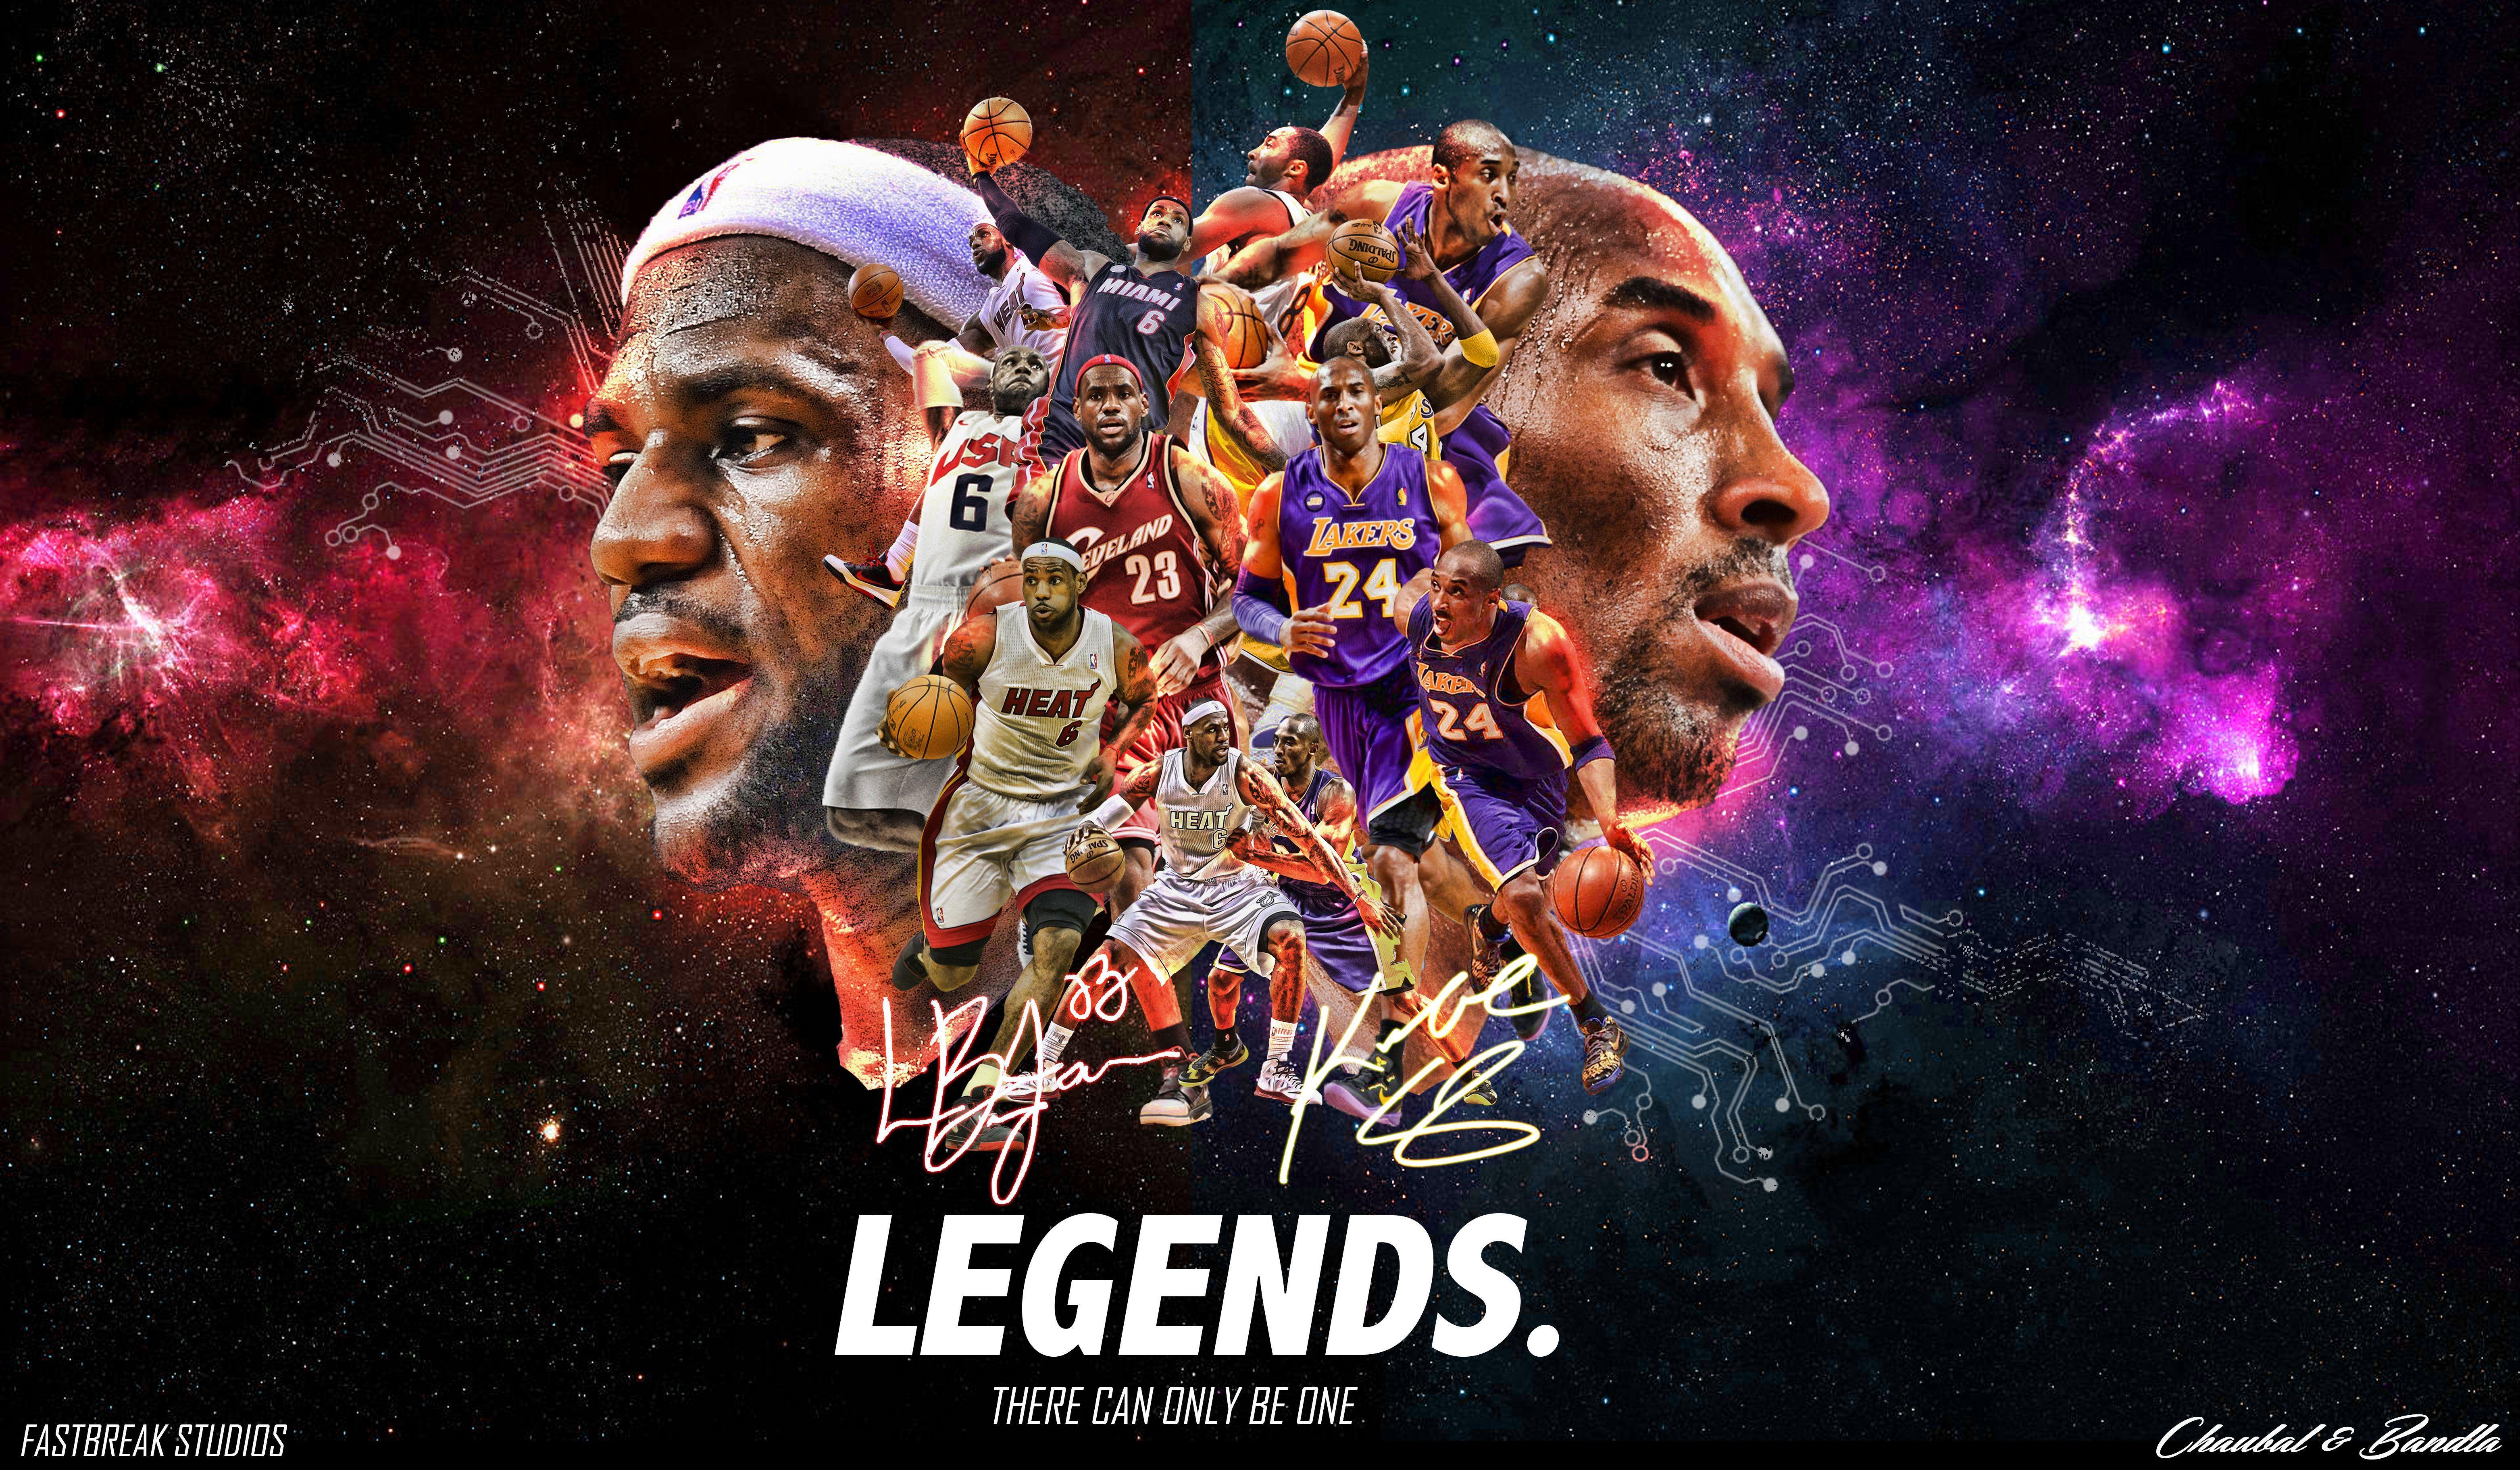 Dope Nba Wallpaper: Nba Legends Wallpaper